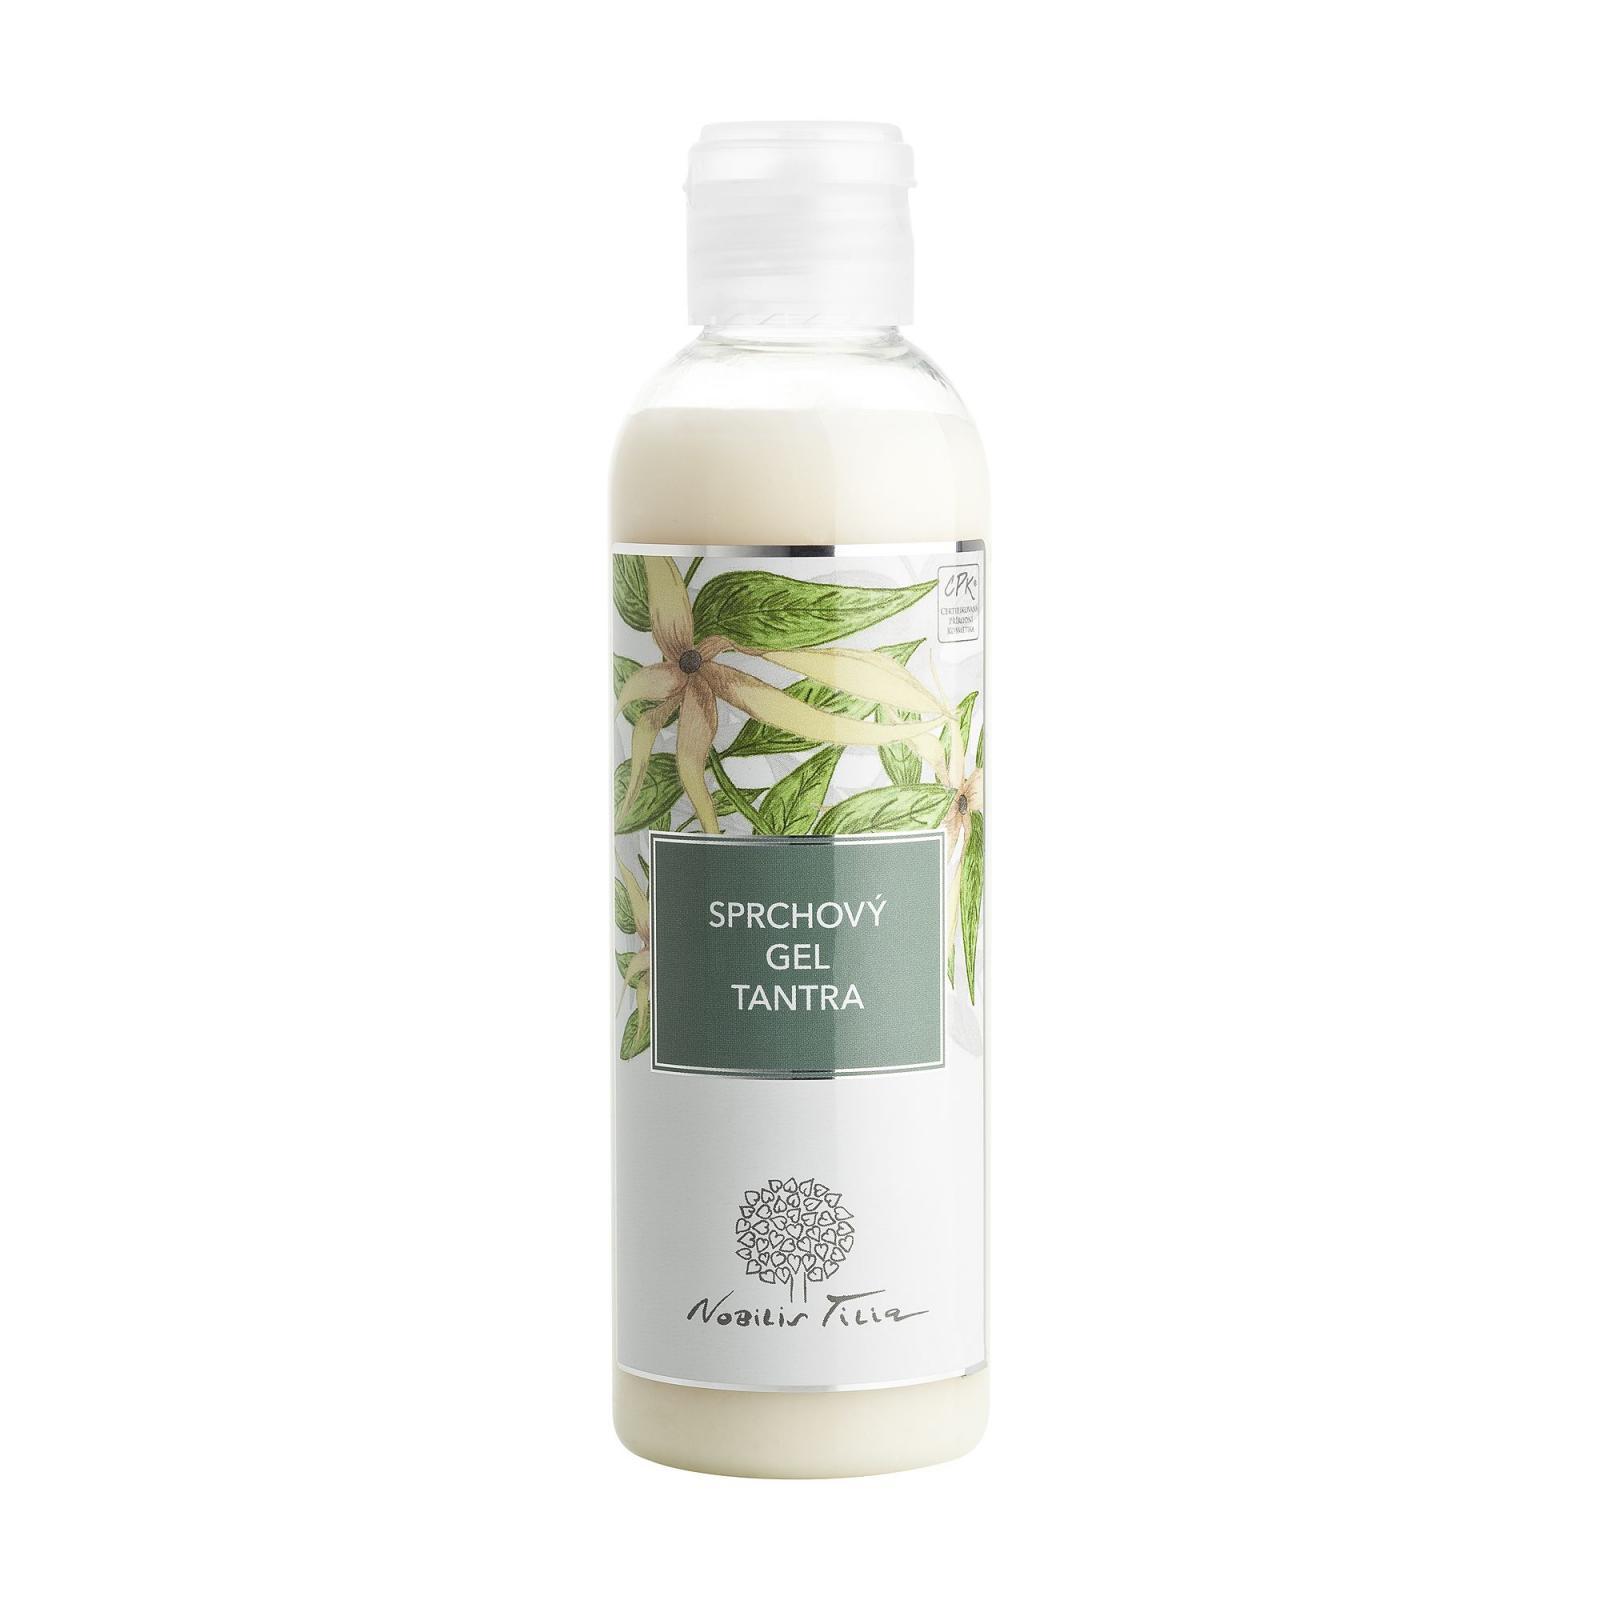 Nobilis Tilia Sprchový gel Tantra 200 ml